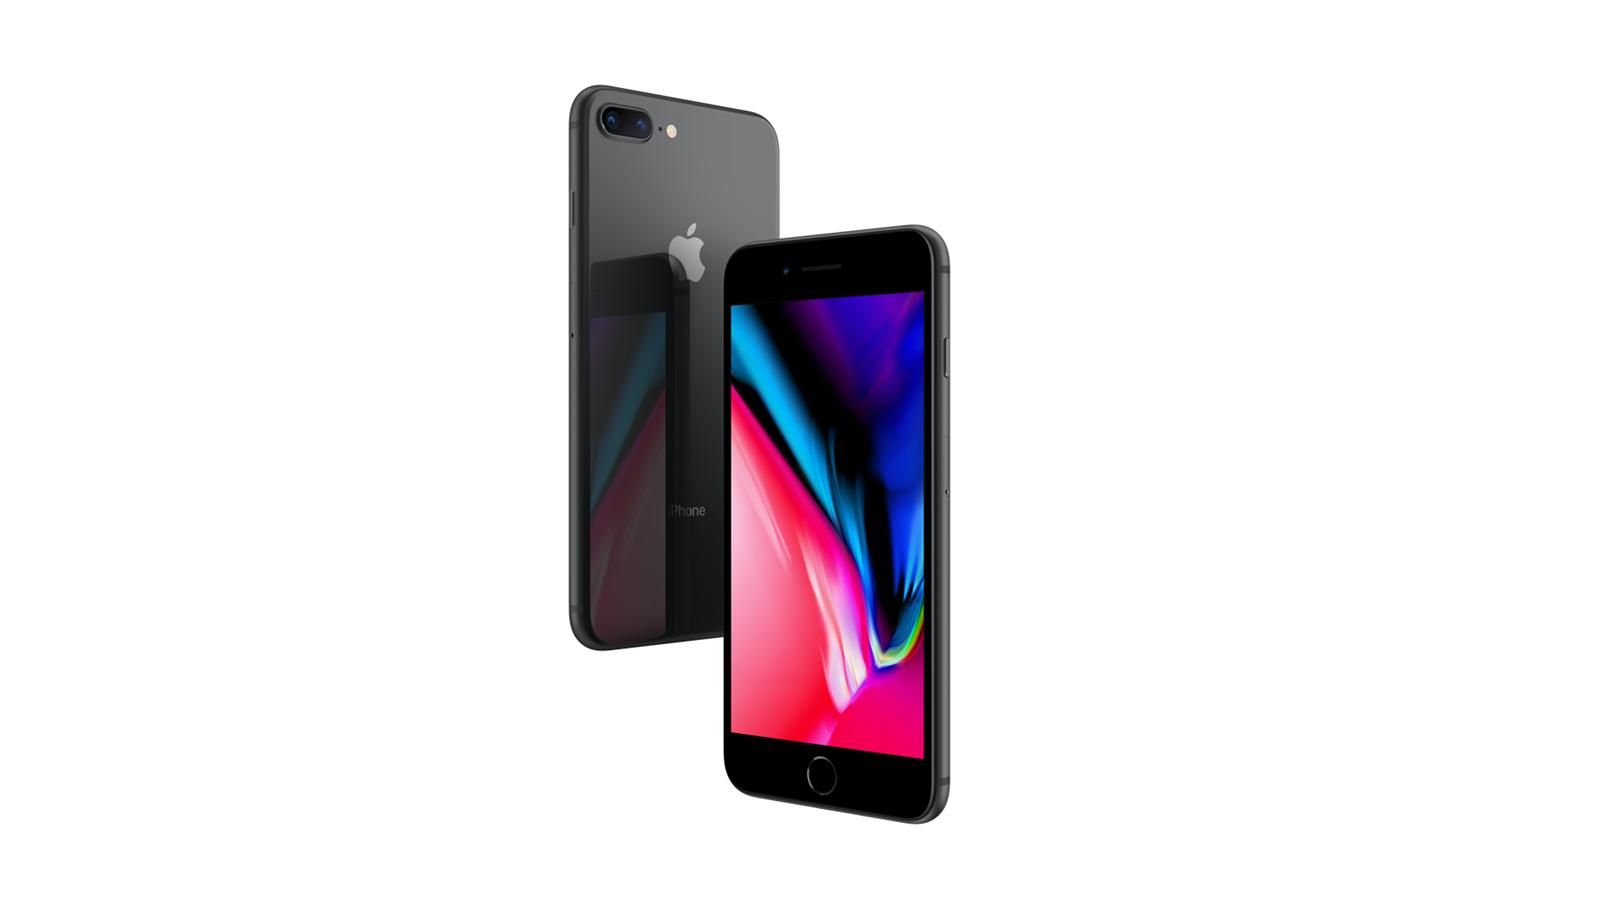 Apple iPhone 8 Plus 64GB - Space Grey (MQ8L2MY/A)